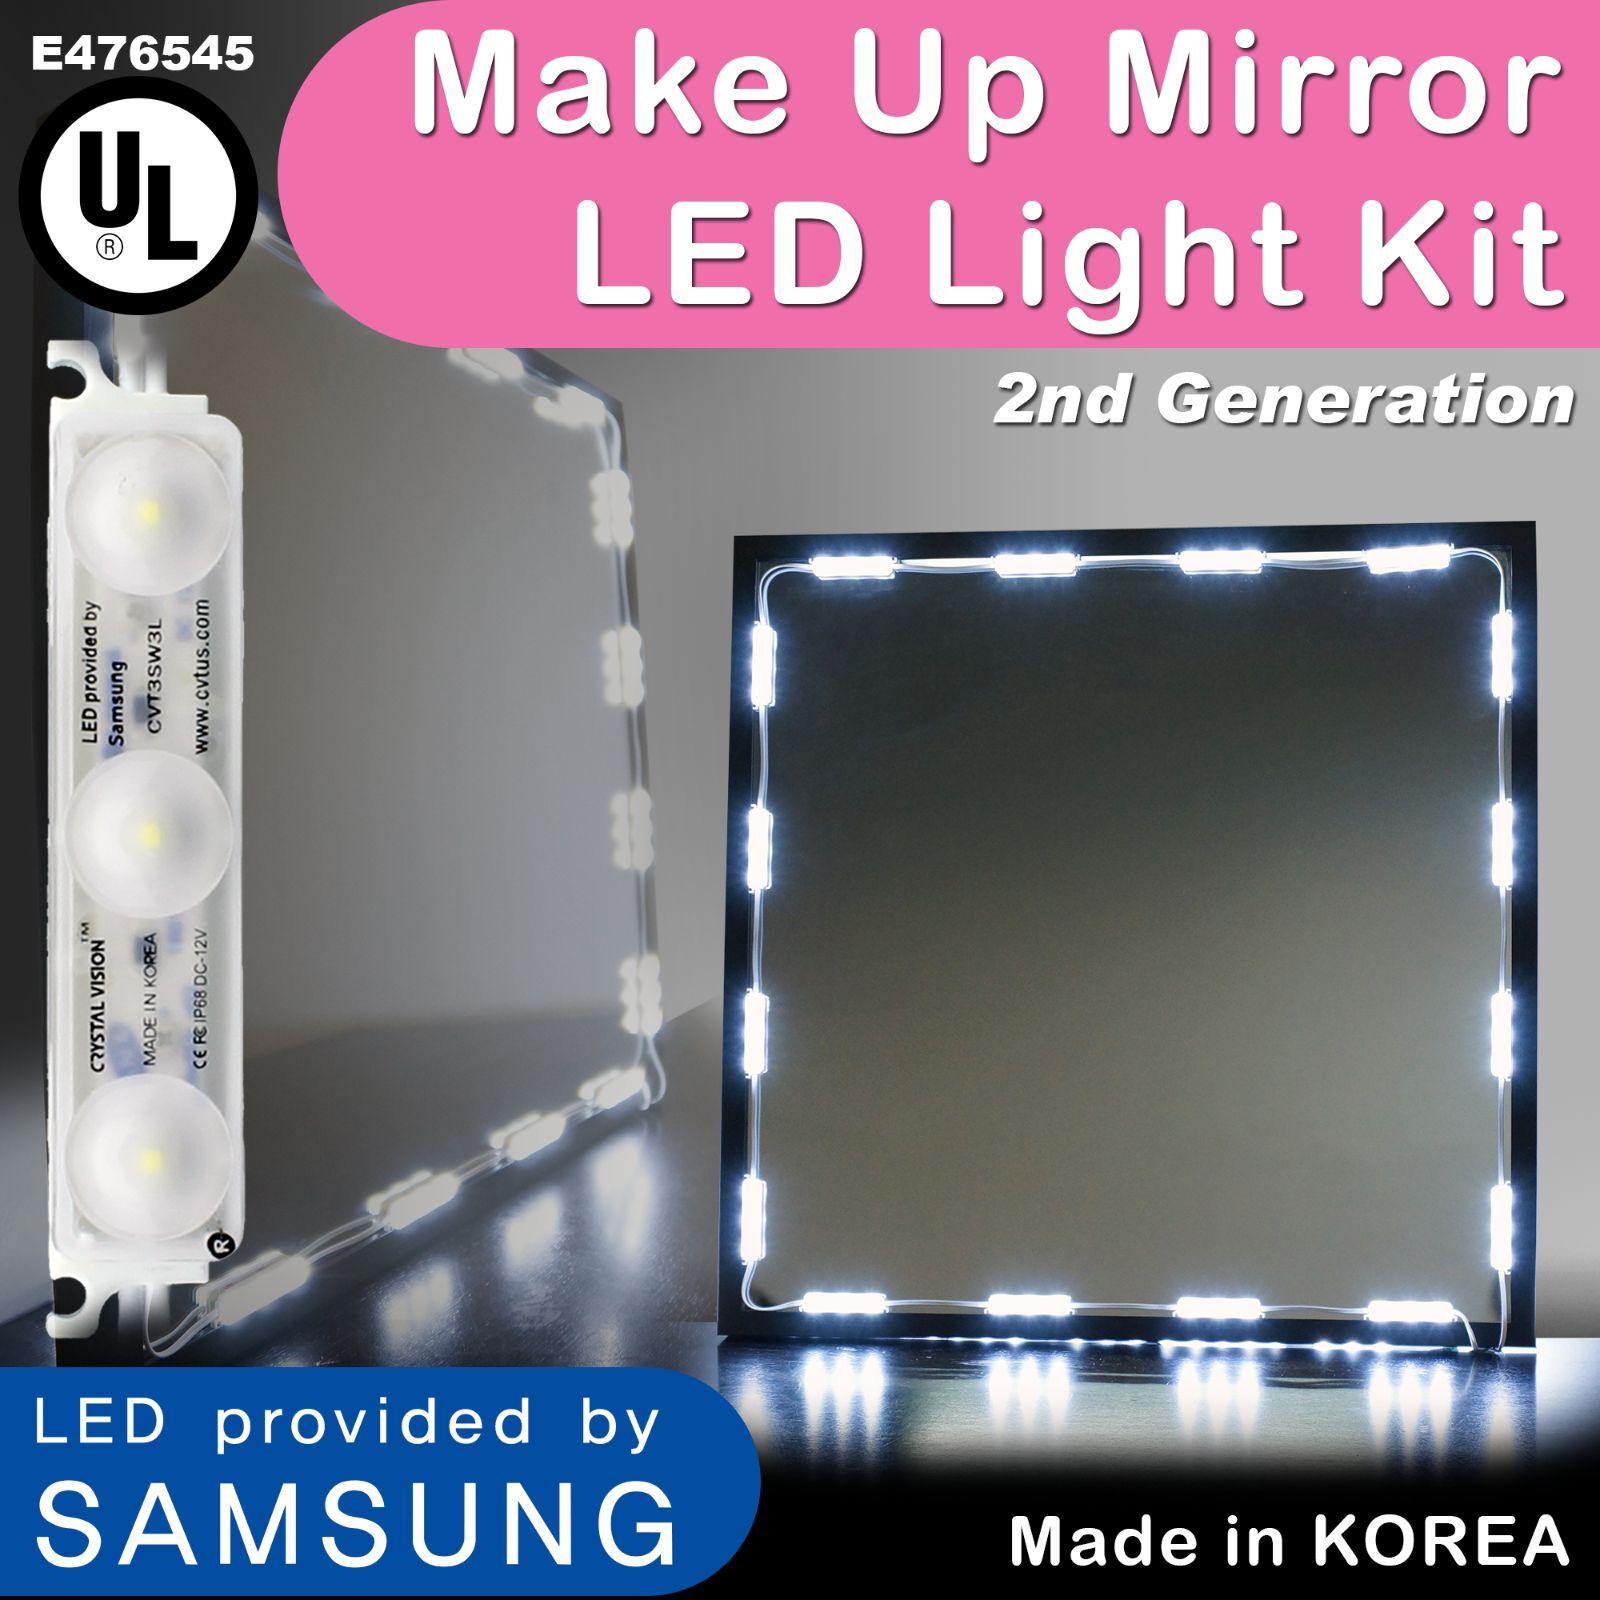 Crystal Vision Samsung Make Up Mirror LED Light Kit 12ft for Vanity Room & Frame